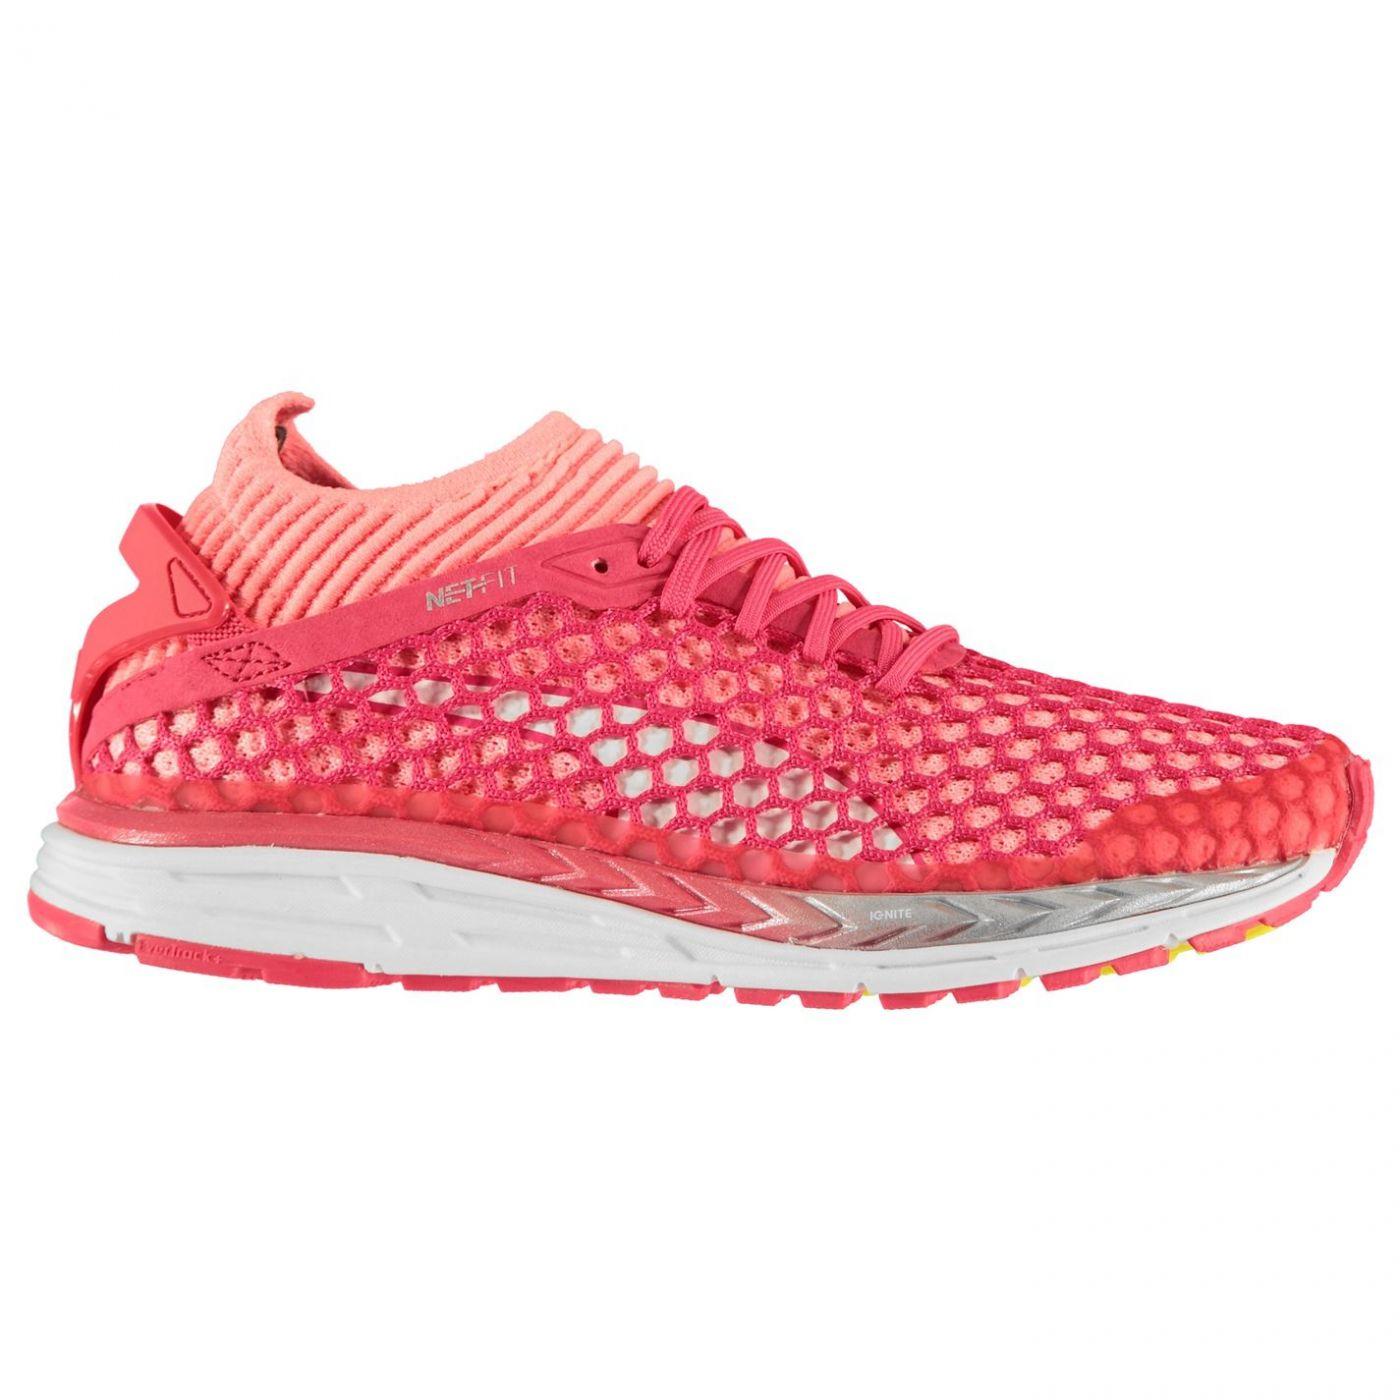 Puma Speed IGNITE Netfit Ladies Running Shoes